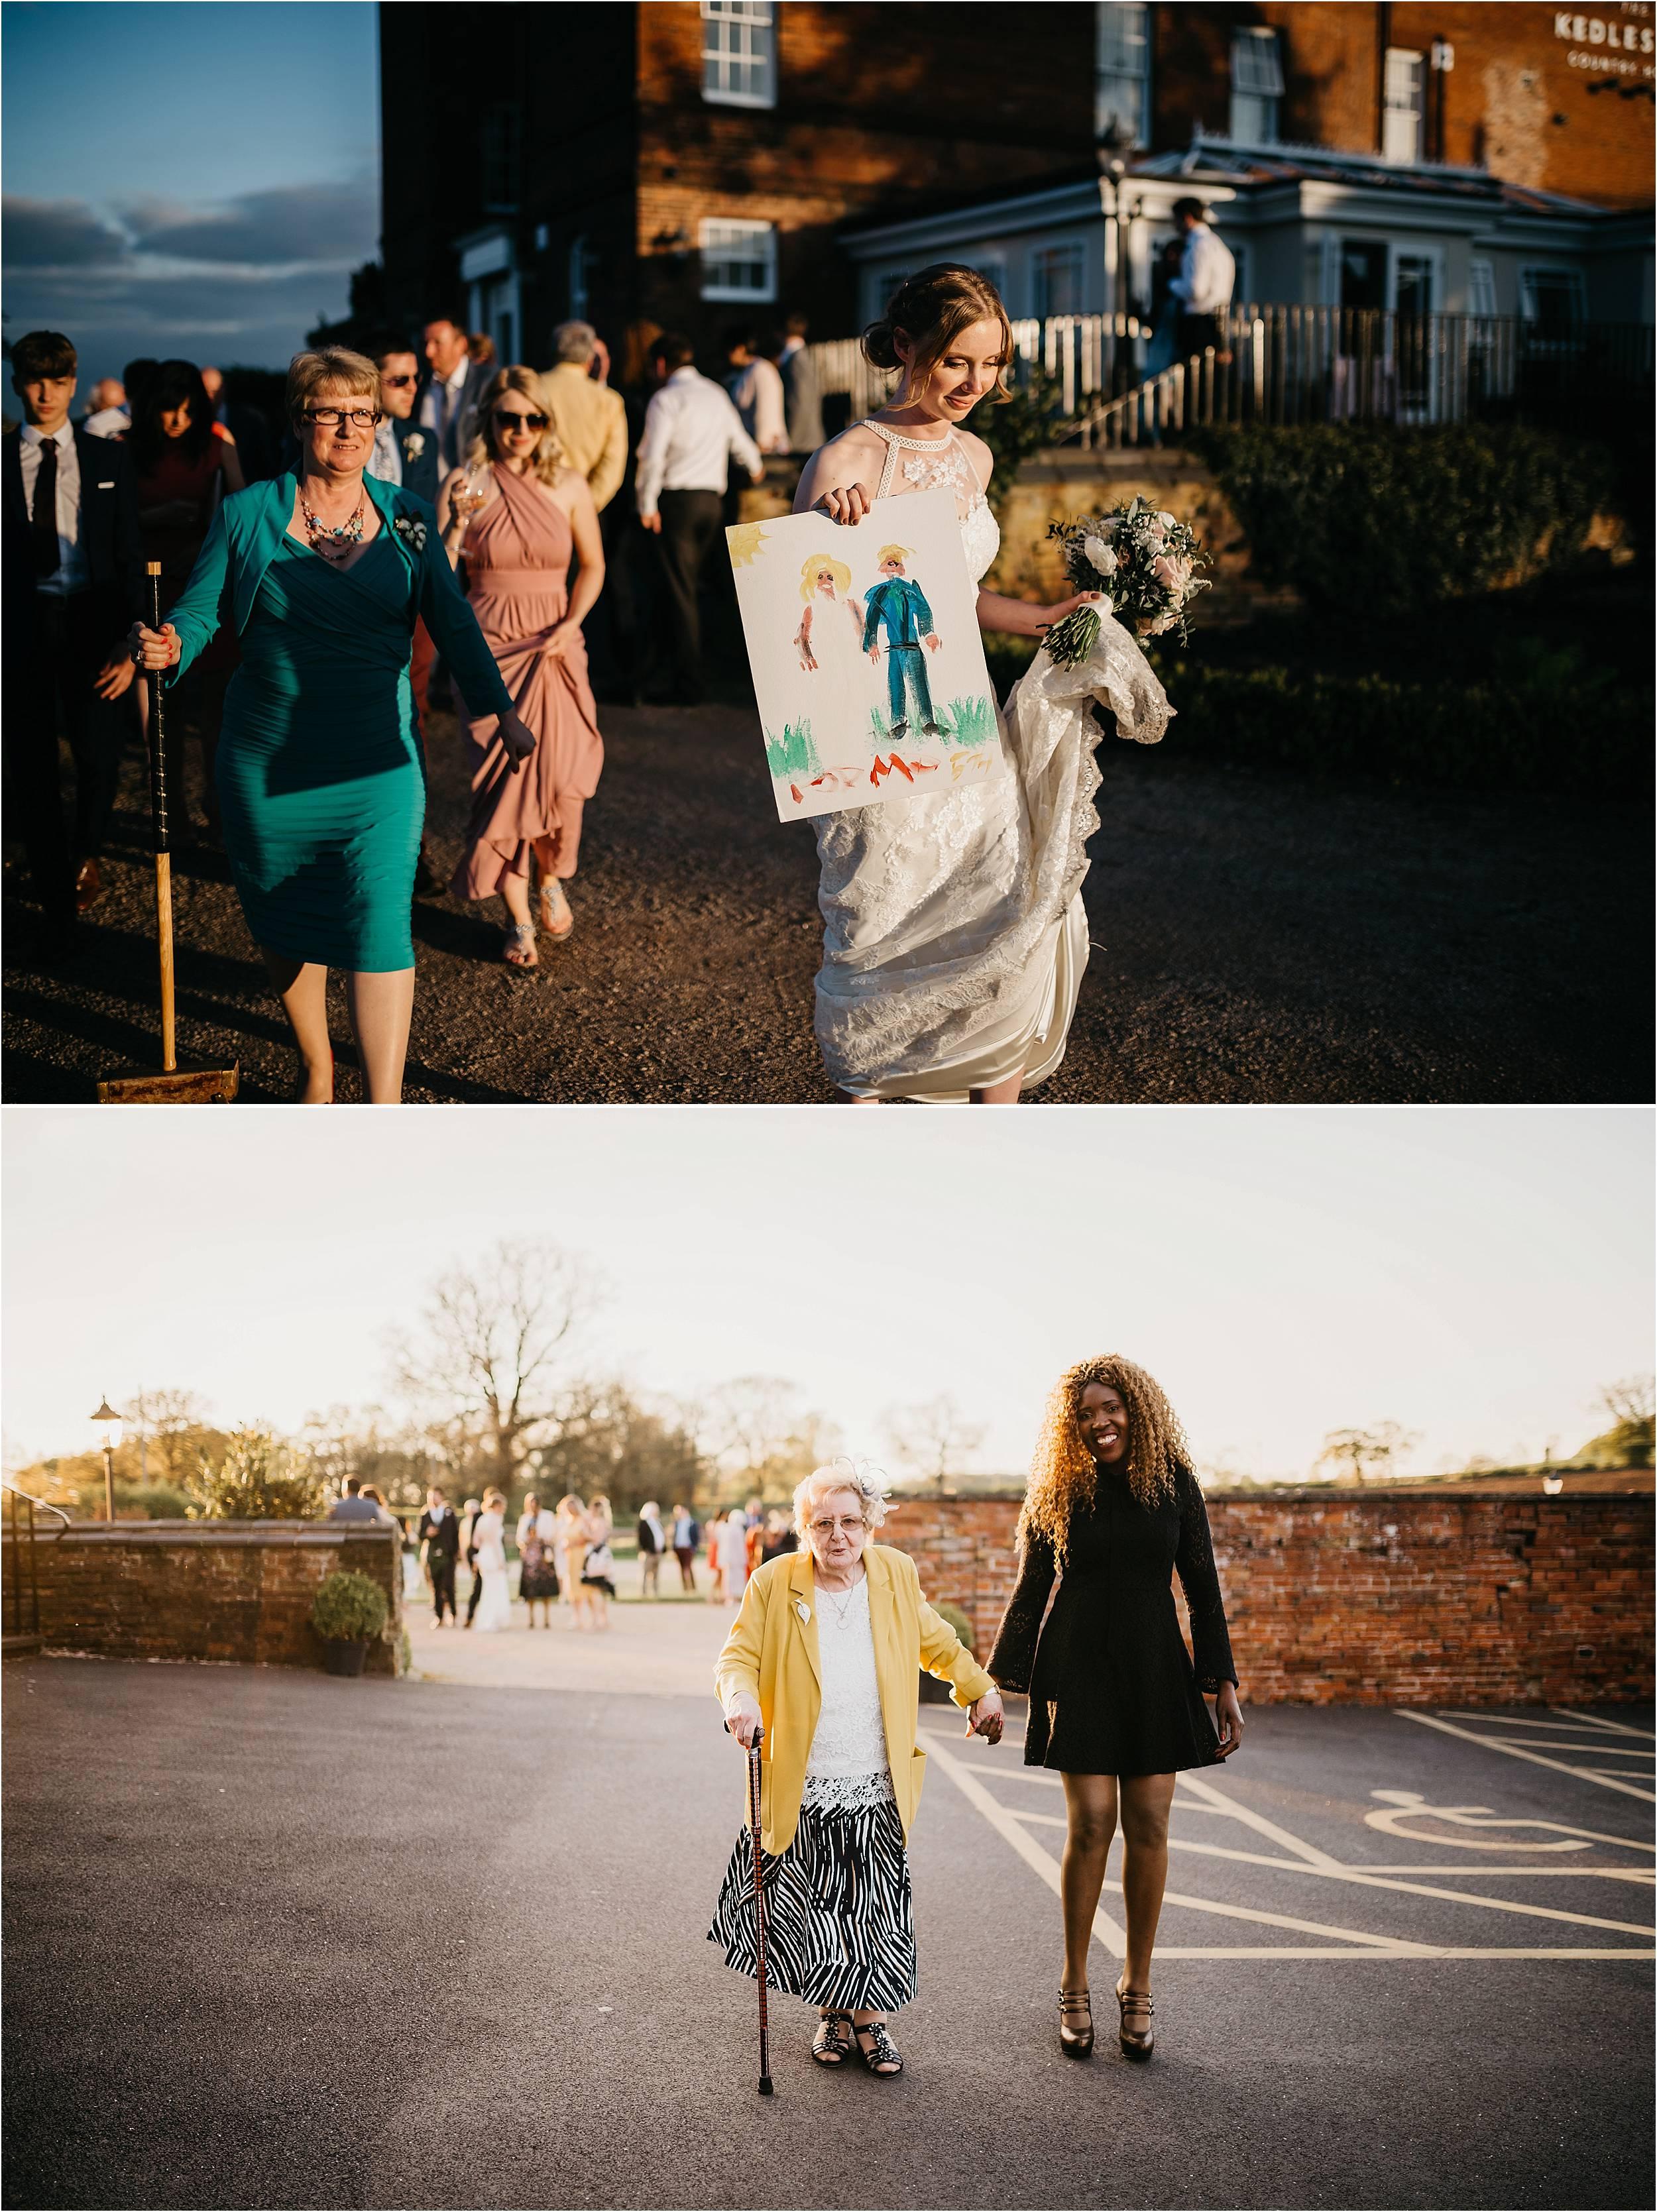 Kedleston Country House Wedding Photography_0099.jpg